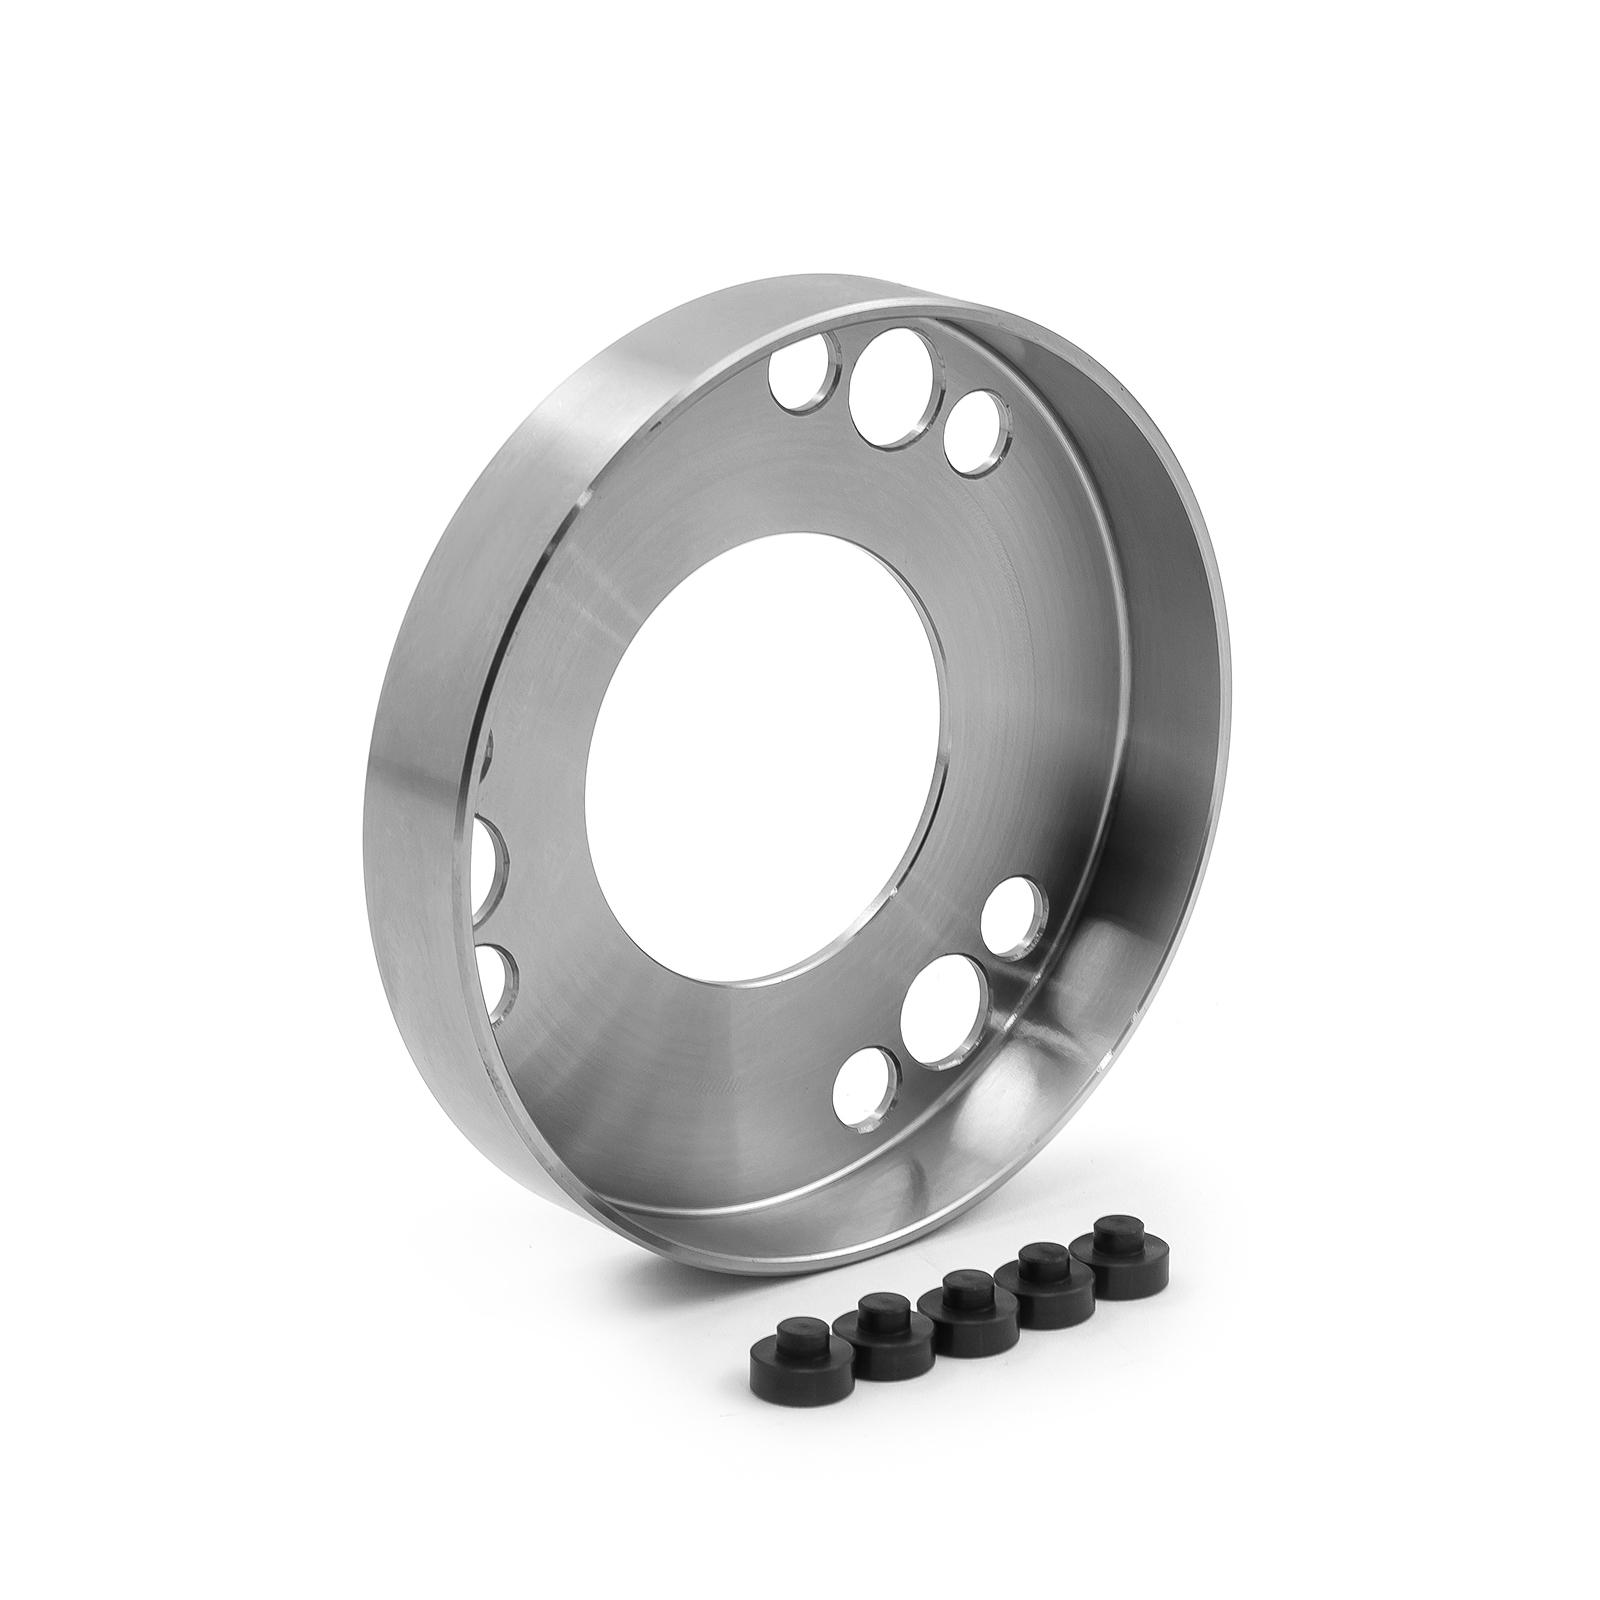 GM Powerglide Ring Gear Stabilizer